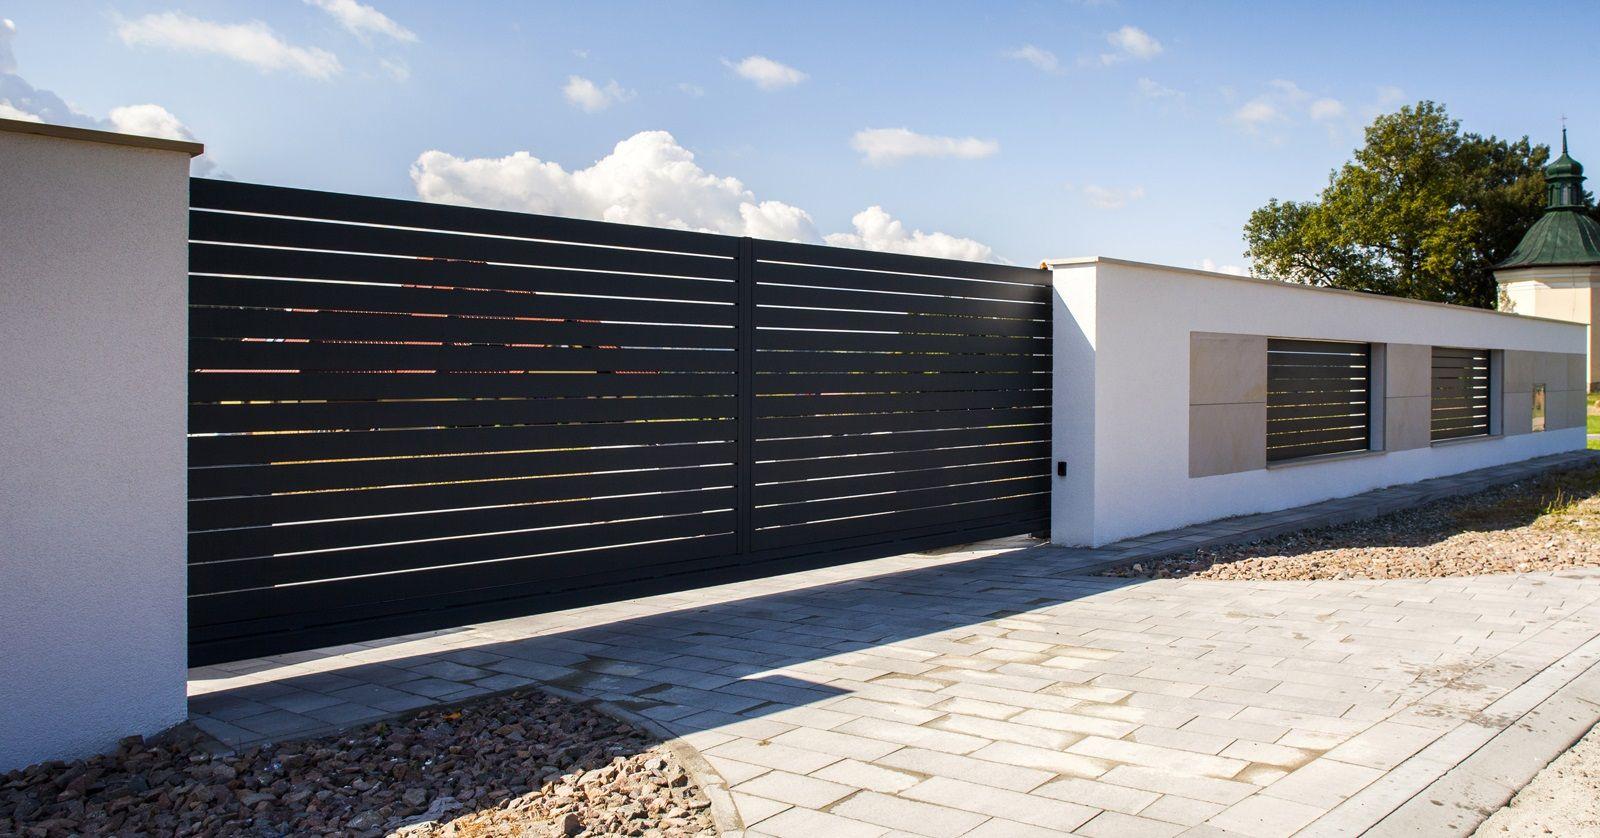 nowoczesne ogrodzenie aluminiowe xcel horizon modern. Black Bedroom Furniture Sets. Home Design Ideas